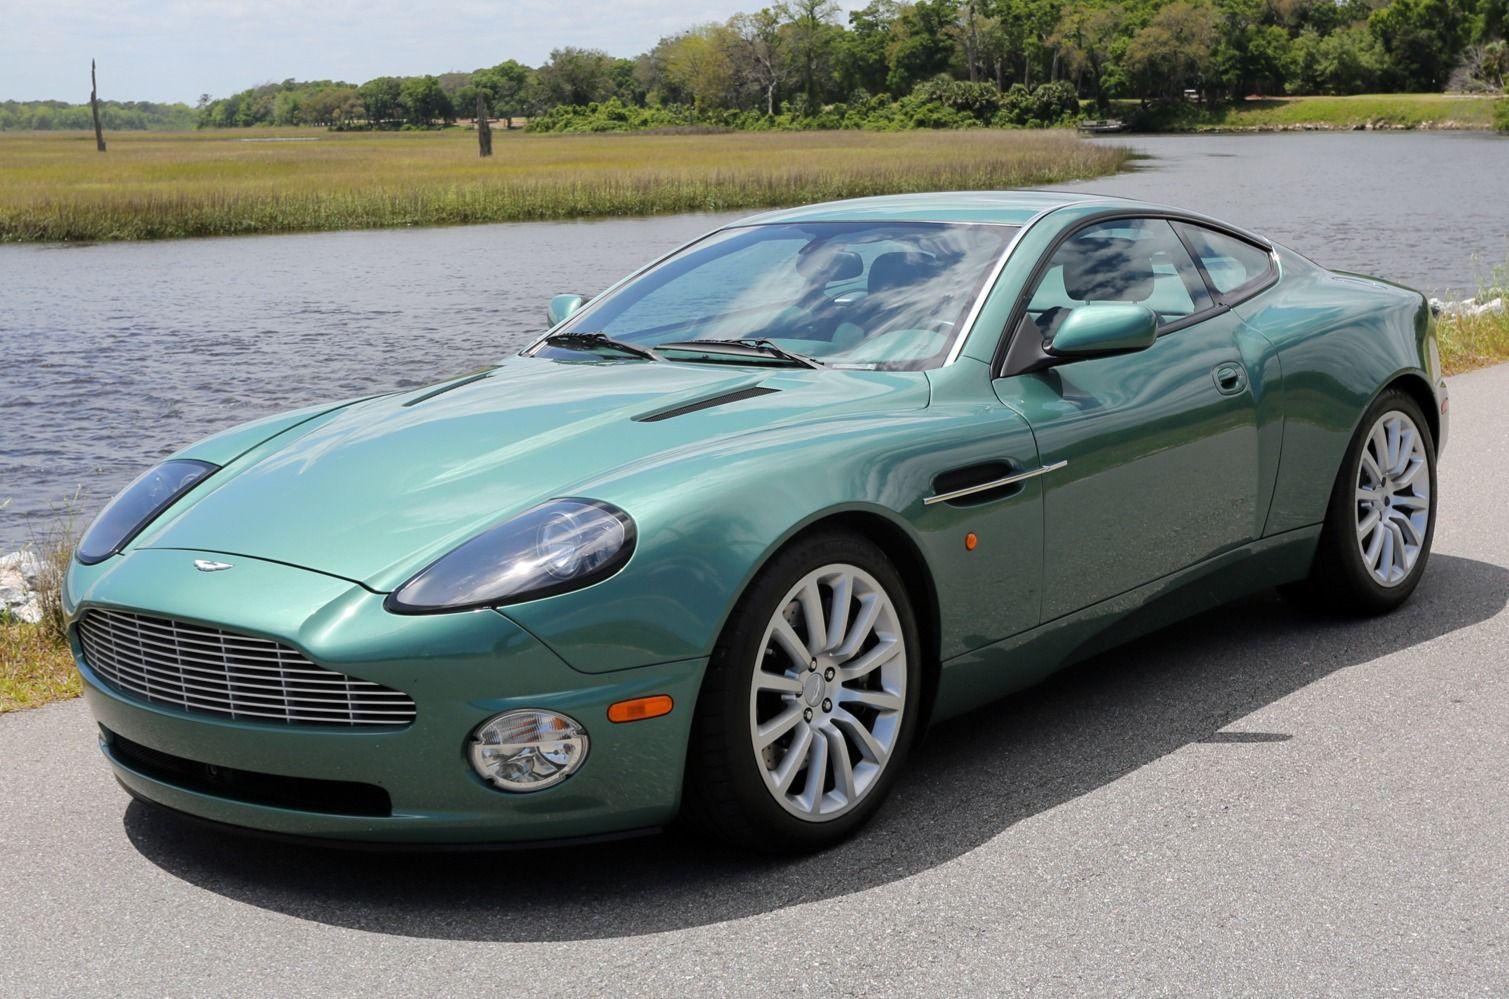 8k Mile 2002 Aston Martin V12 Vanquish Aston Martin V12 Aston Martin Vanquish